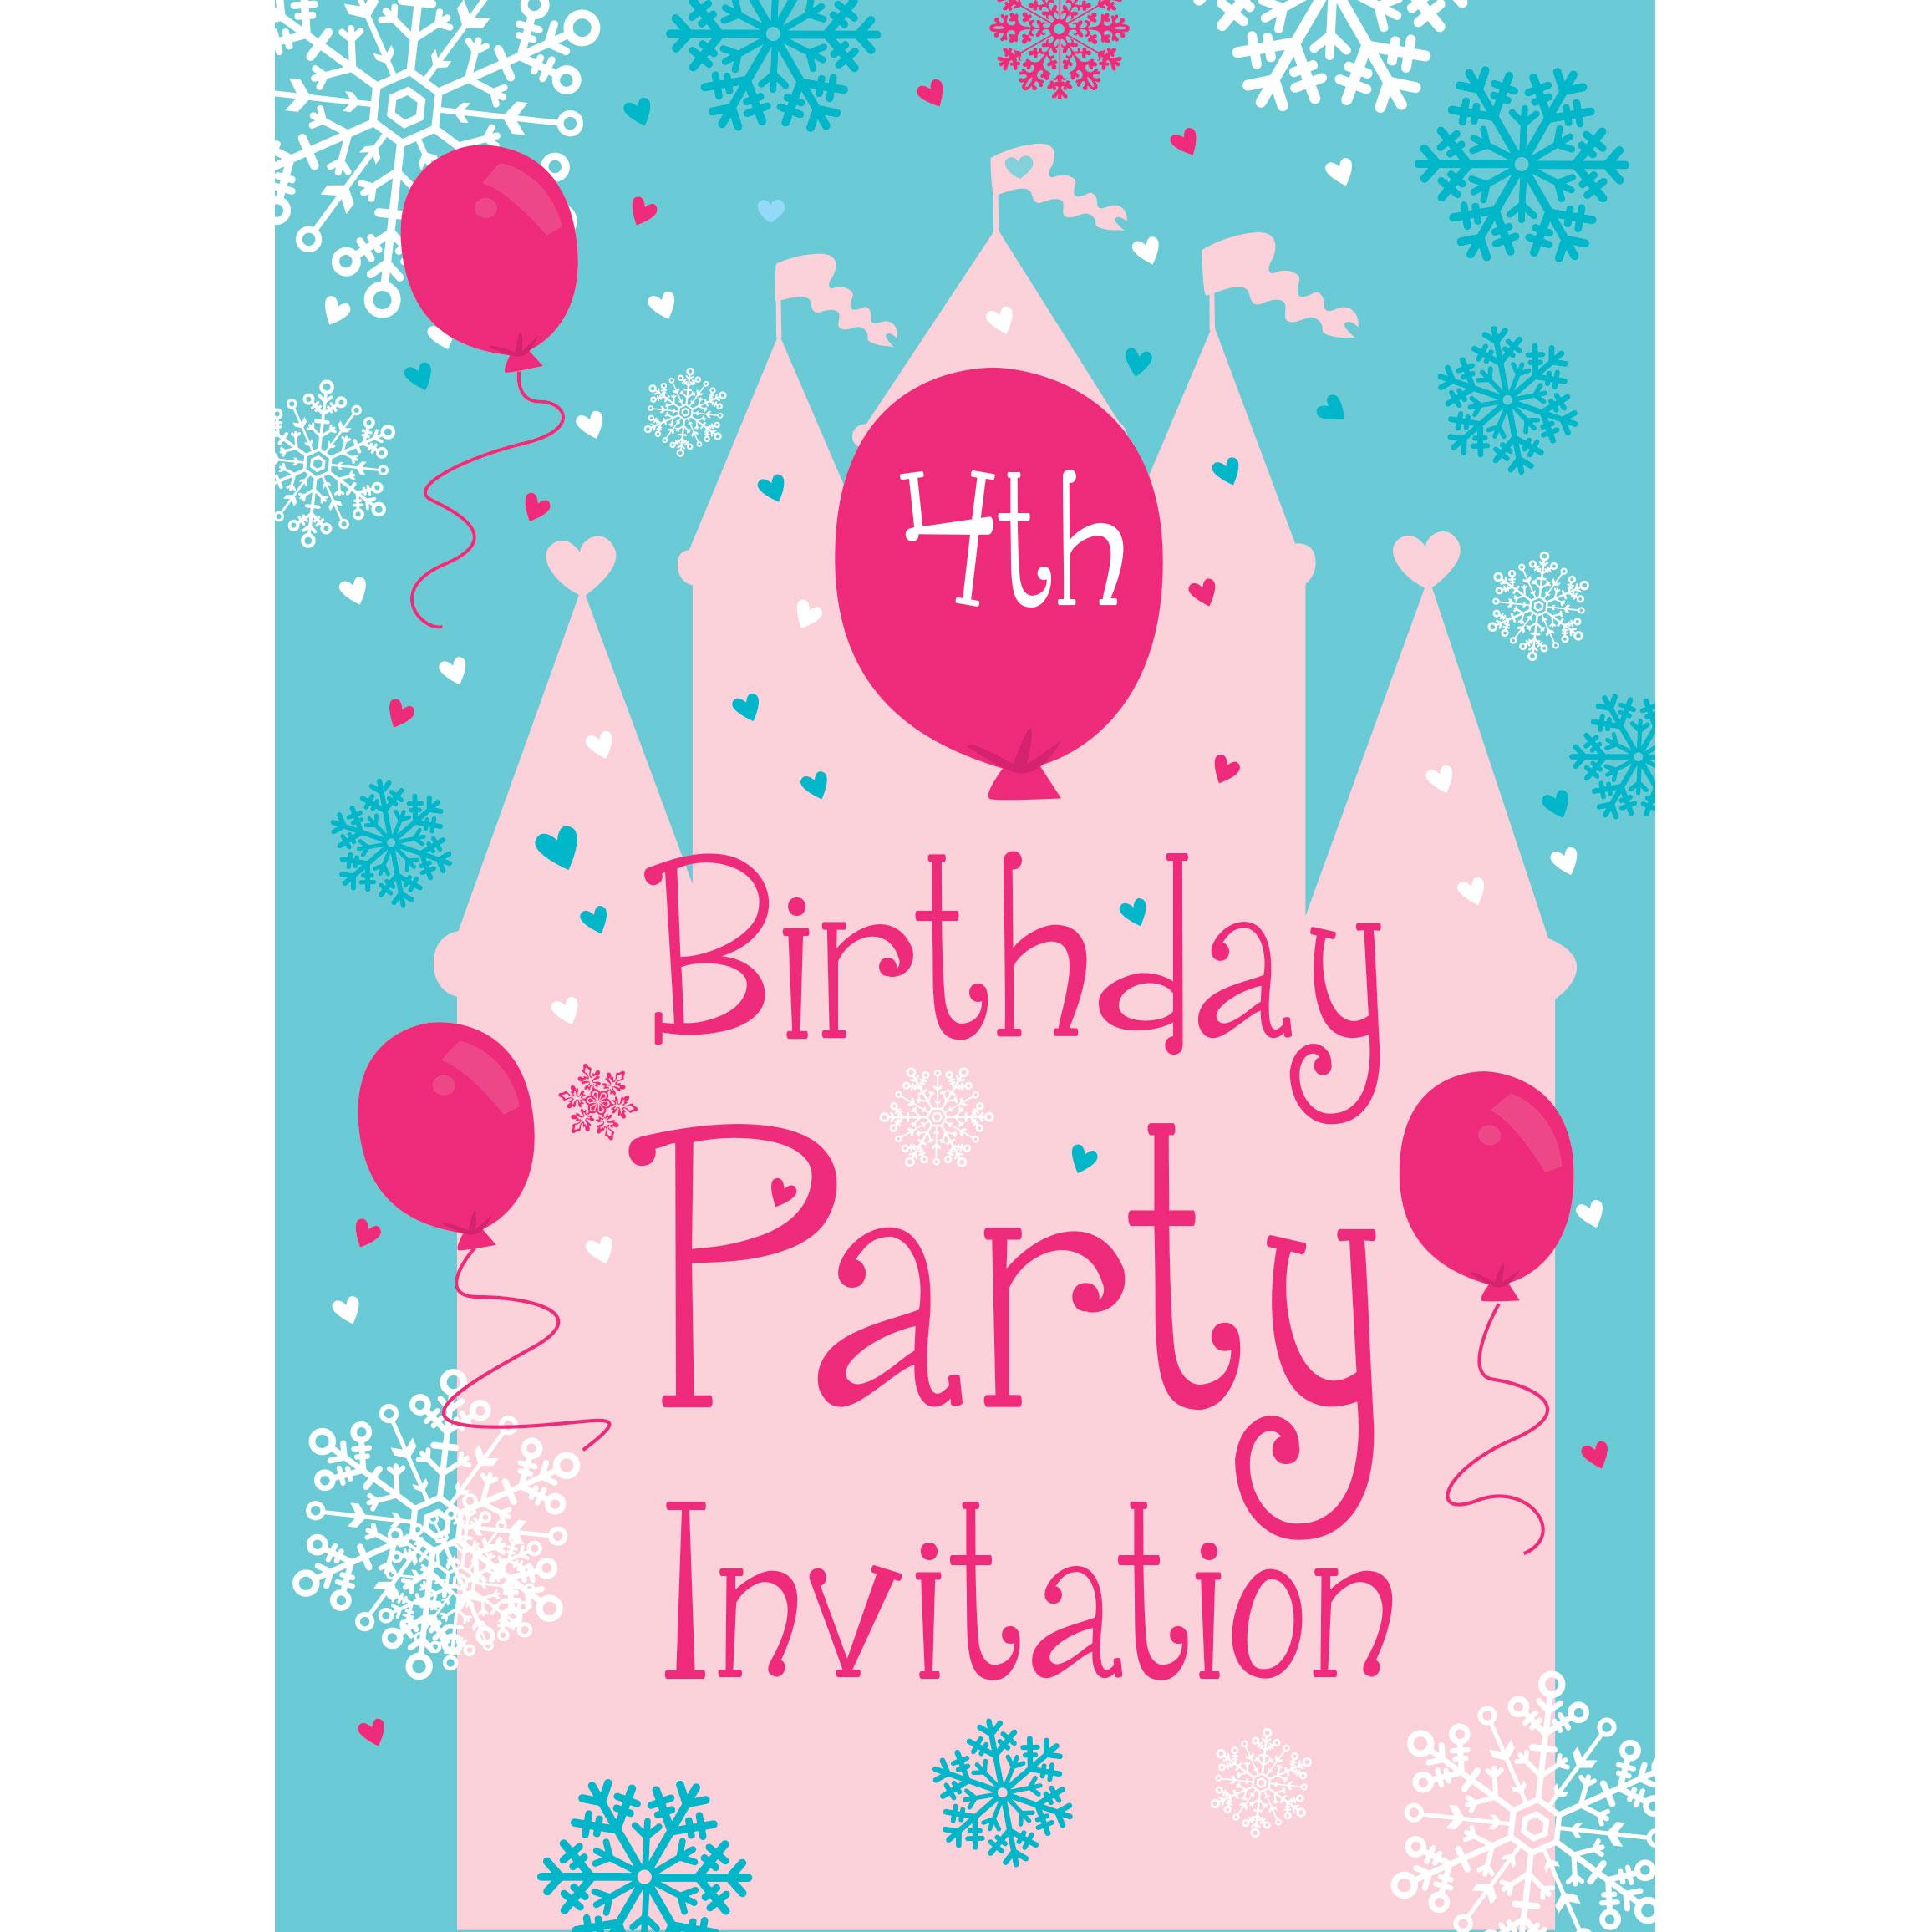 Disney Princess Party Invitations for adorable invitation design